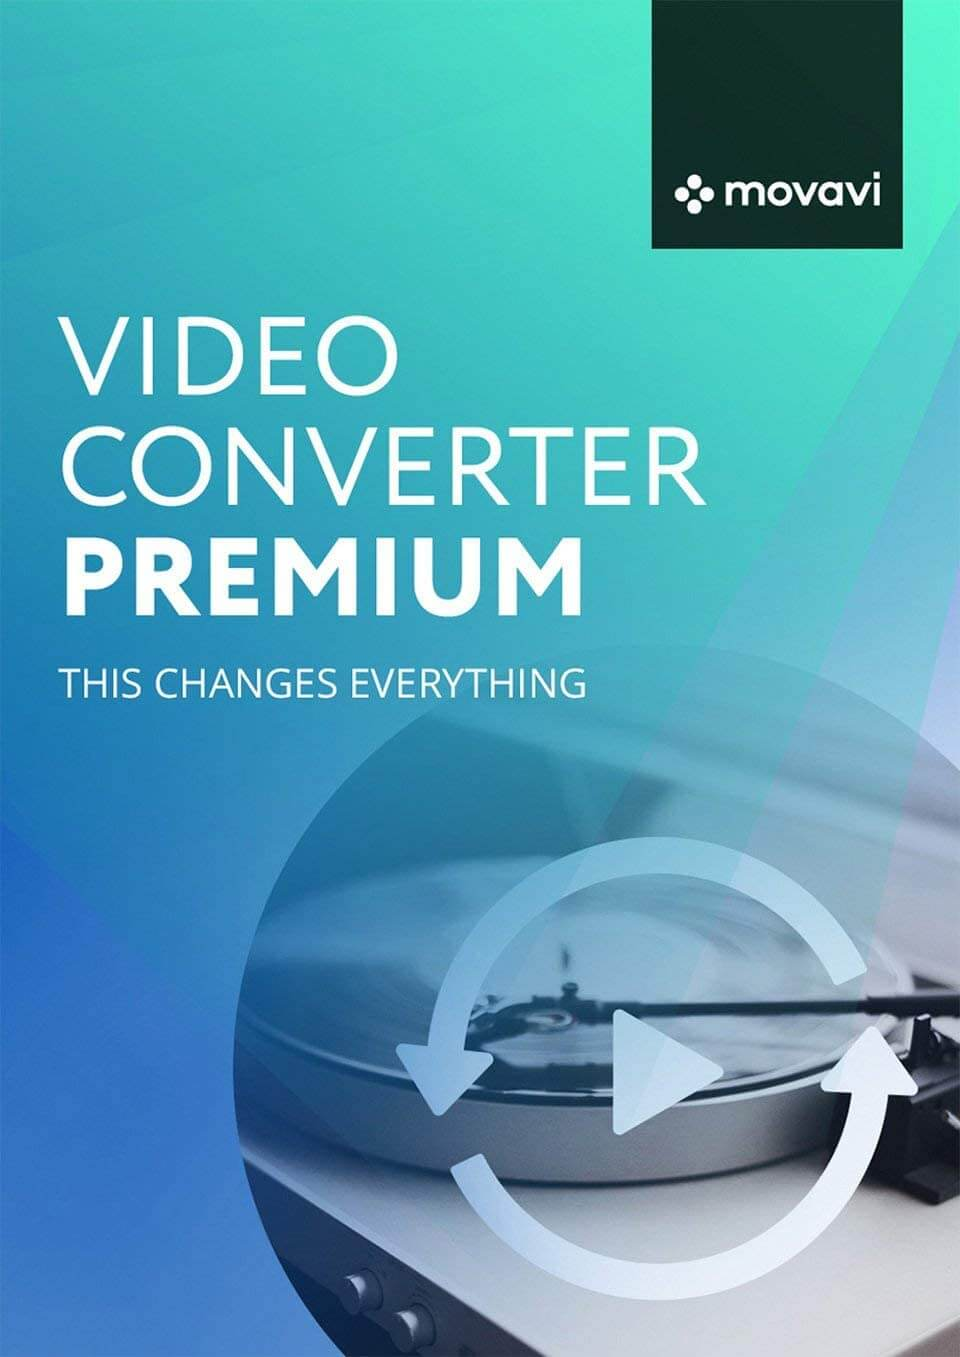 movavi video converter premium activation key